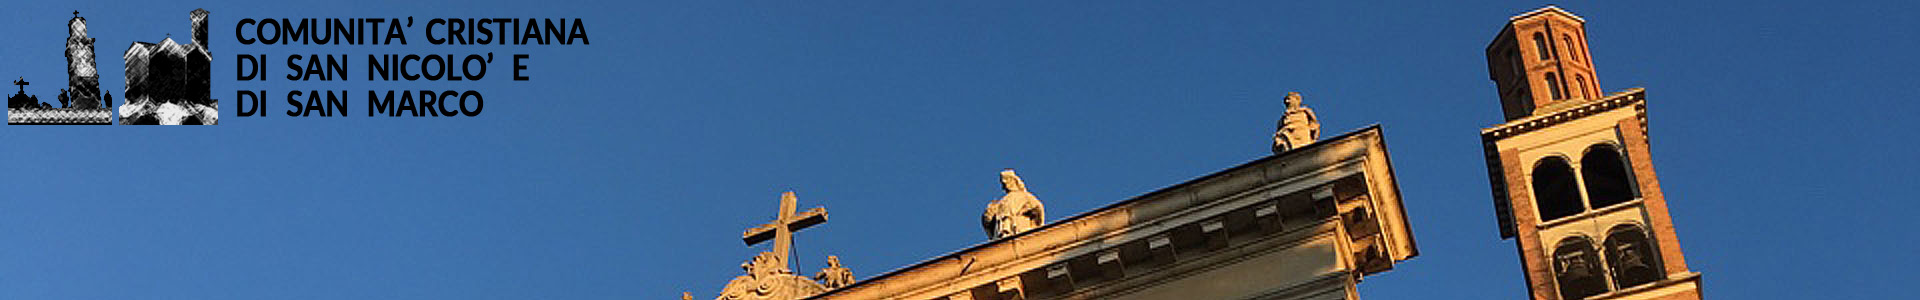 Parrocchie di San Nicolò e San Marco